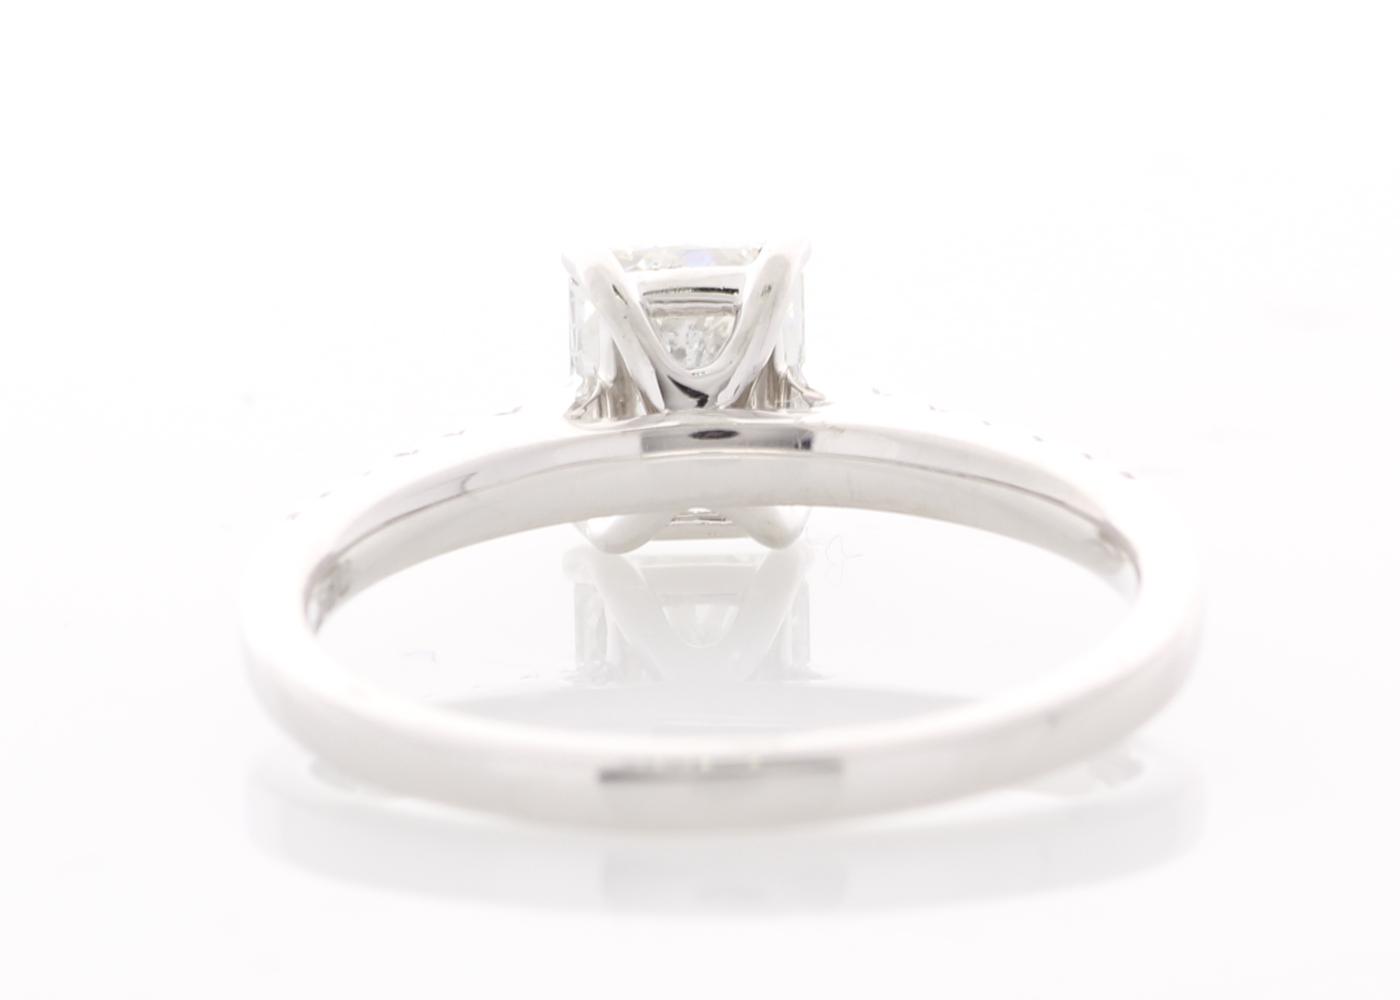 Platinum Stone Set Shoulders Diamond Ring 1.07 Carats - Image 3 of 5